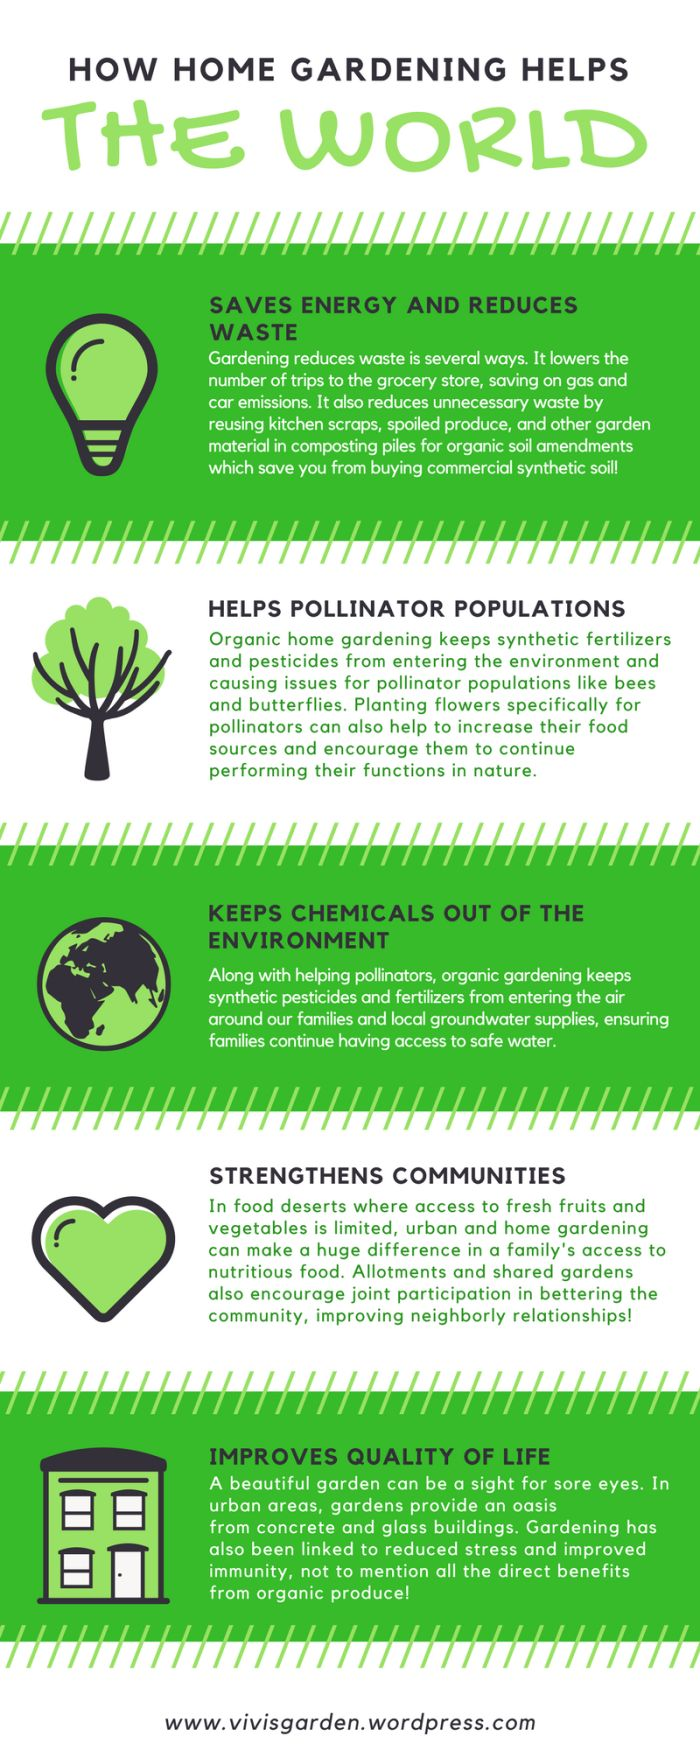 How Home Gardening Helps The World Infographic | Vivi's Garden